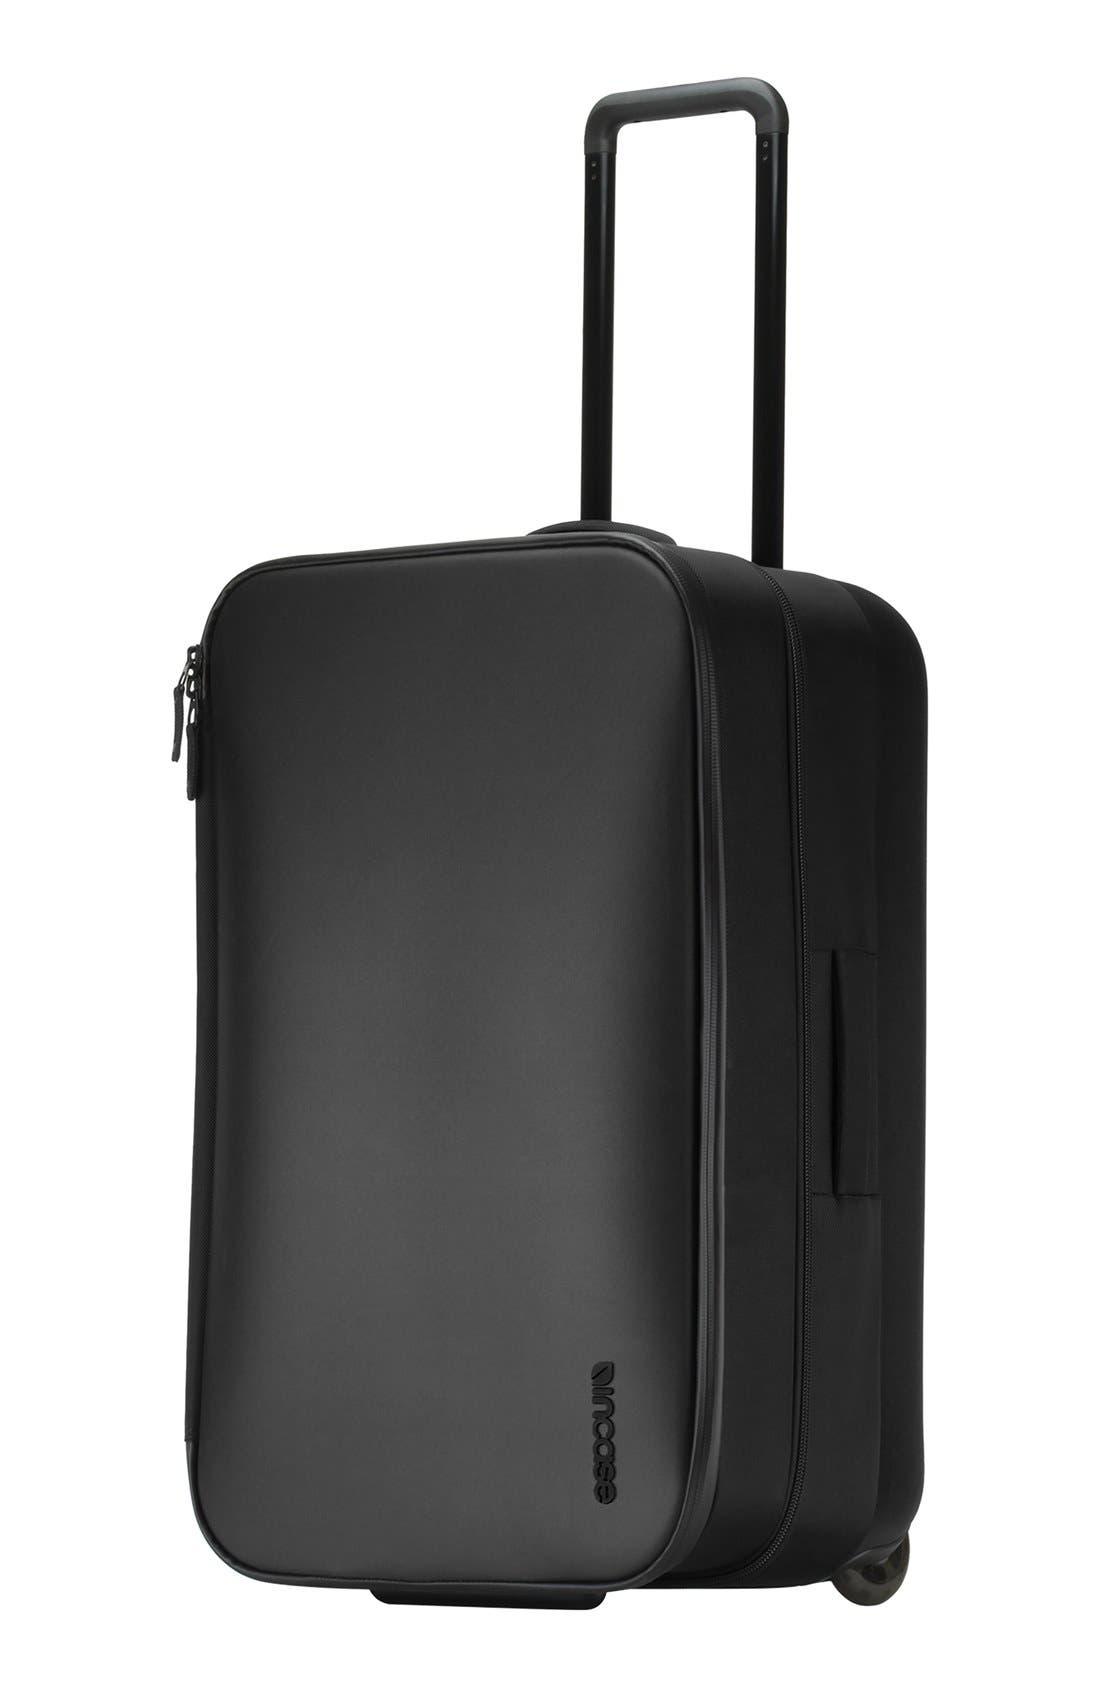 VIA 34 Inch Wheeled Suitcase,                             Alternate thumbnail 4, color,                             001